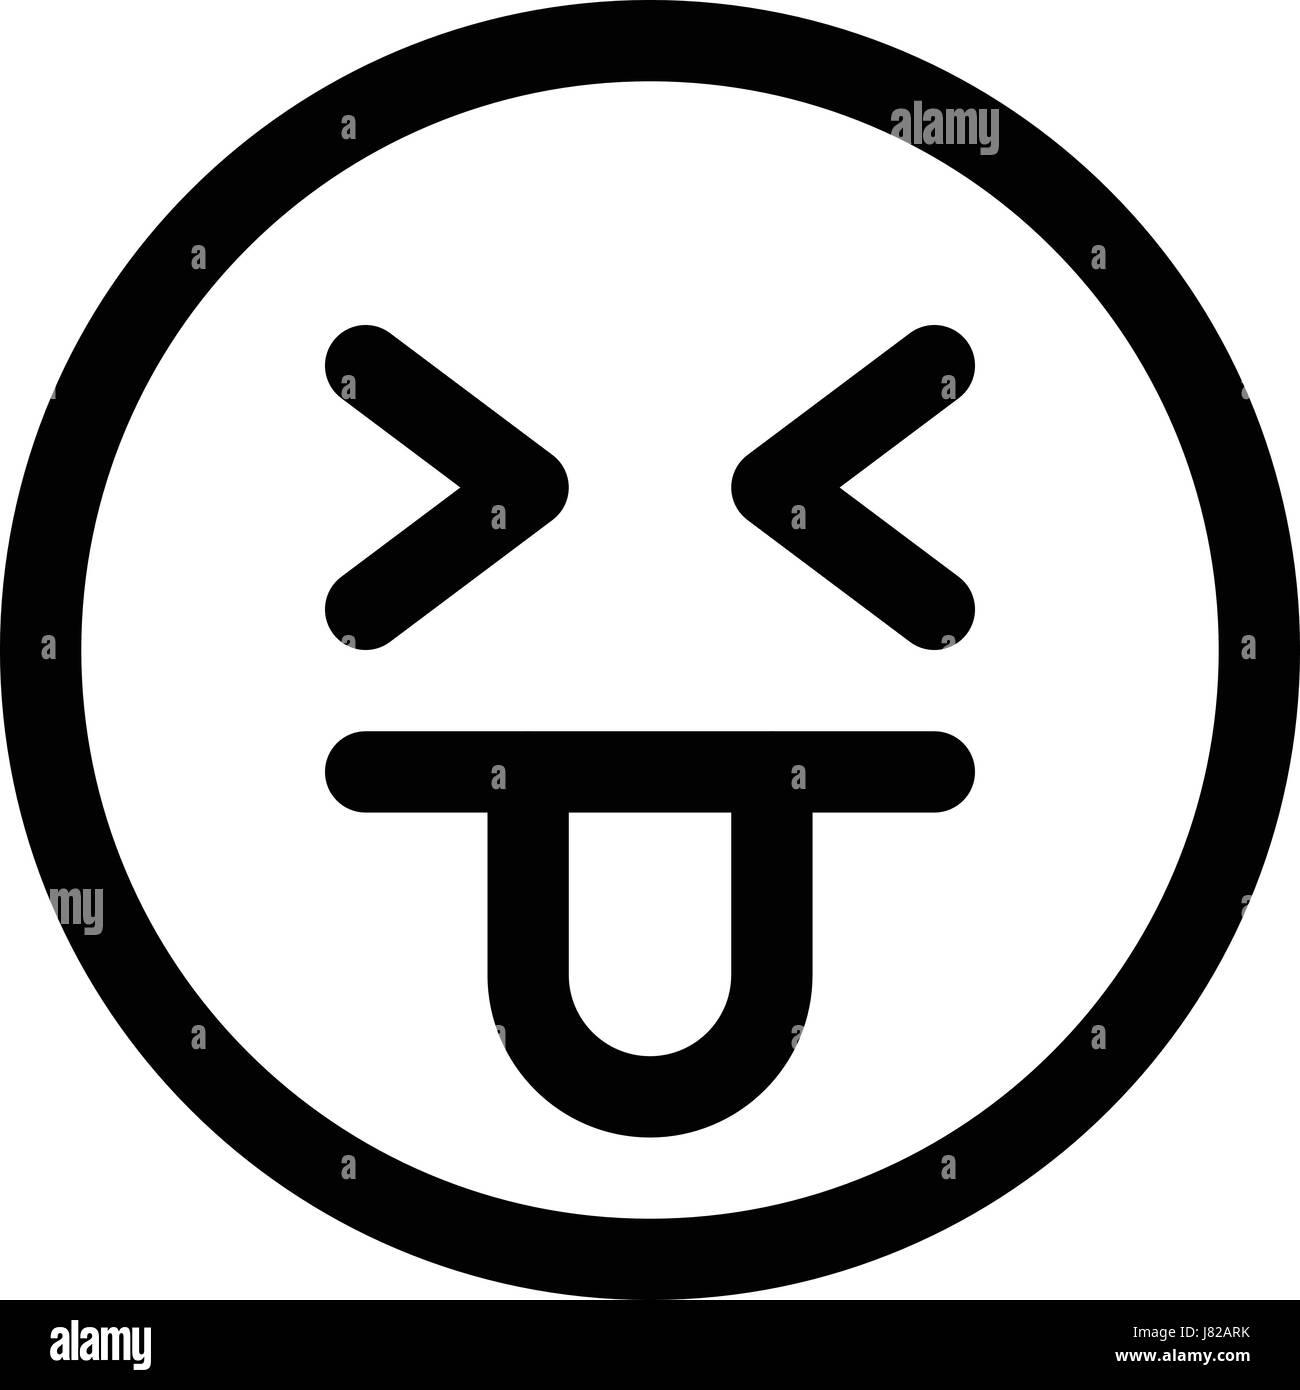 Goofy Emoji Stockfotos & Goofy Emoji Bilder - Alamy